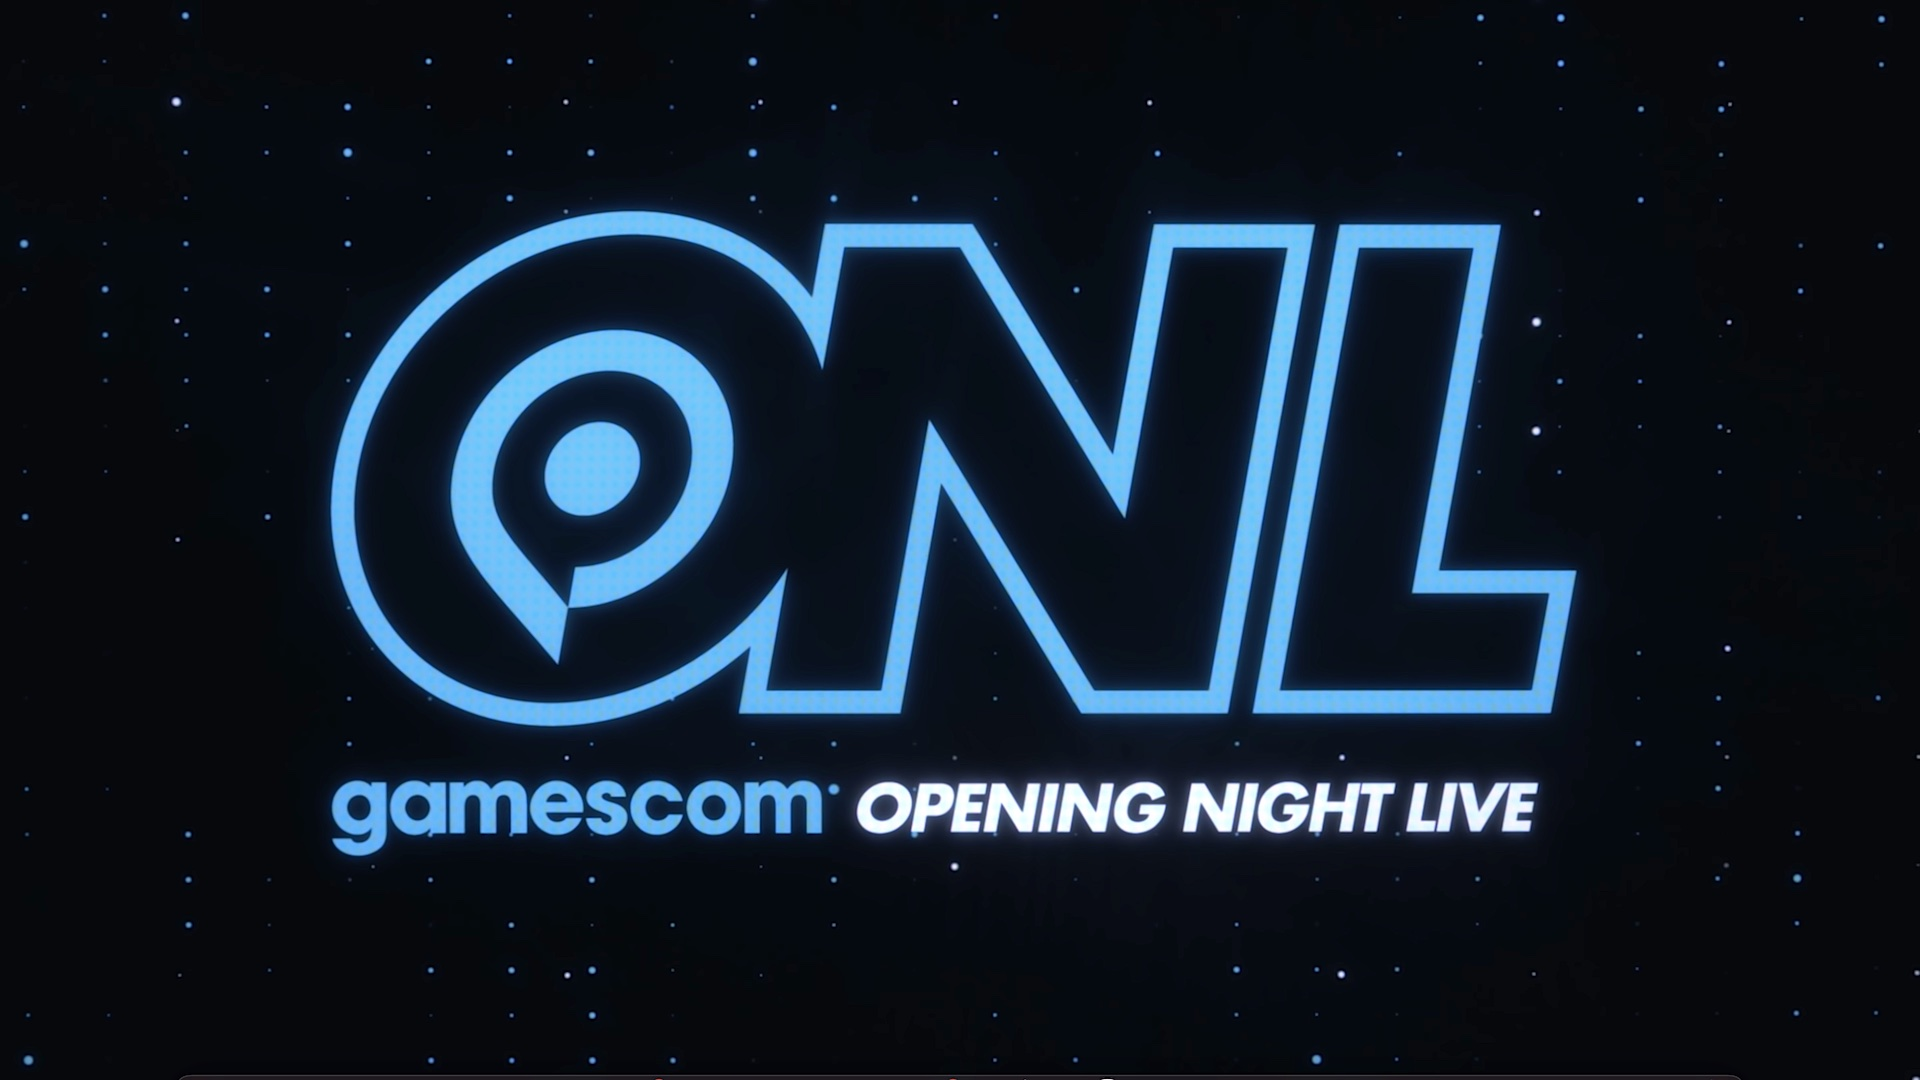 Logo for Gamescom Opening Night Live